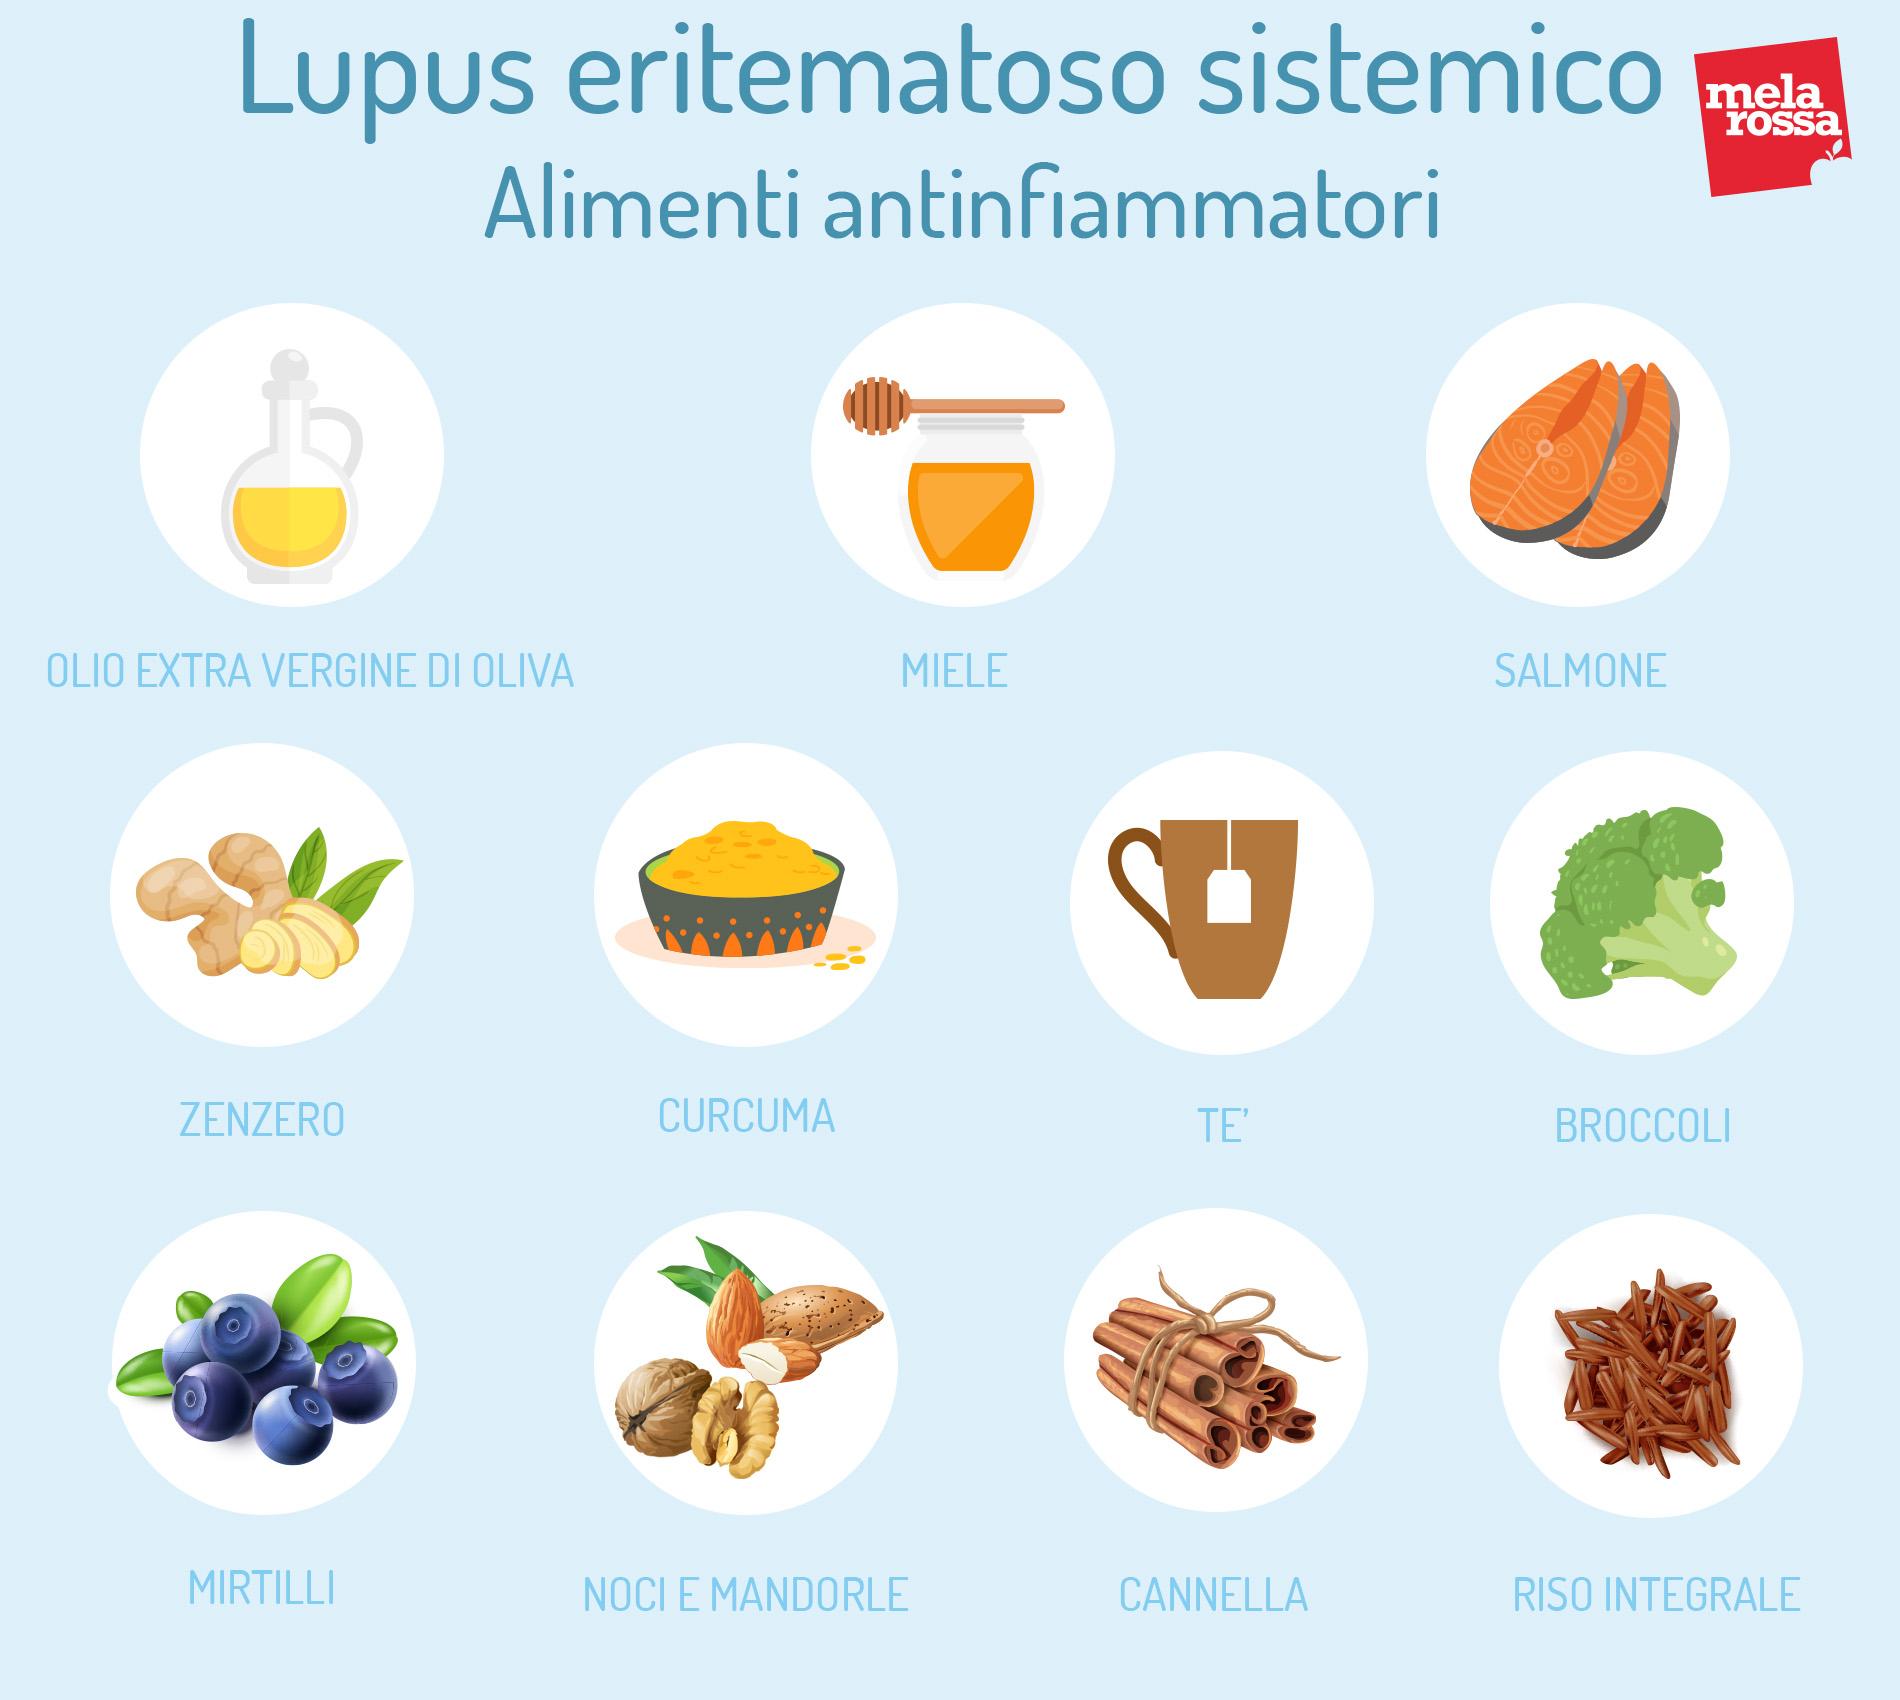 Lupus: alimenti antinfiammatori da integrare nella dieta